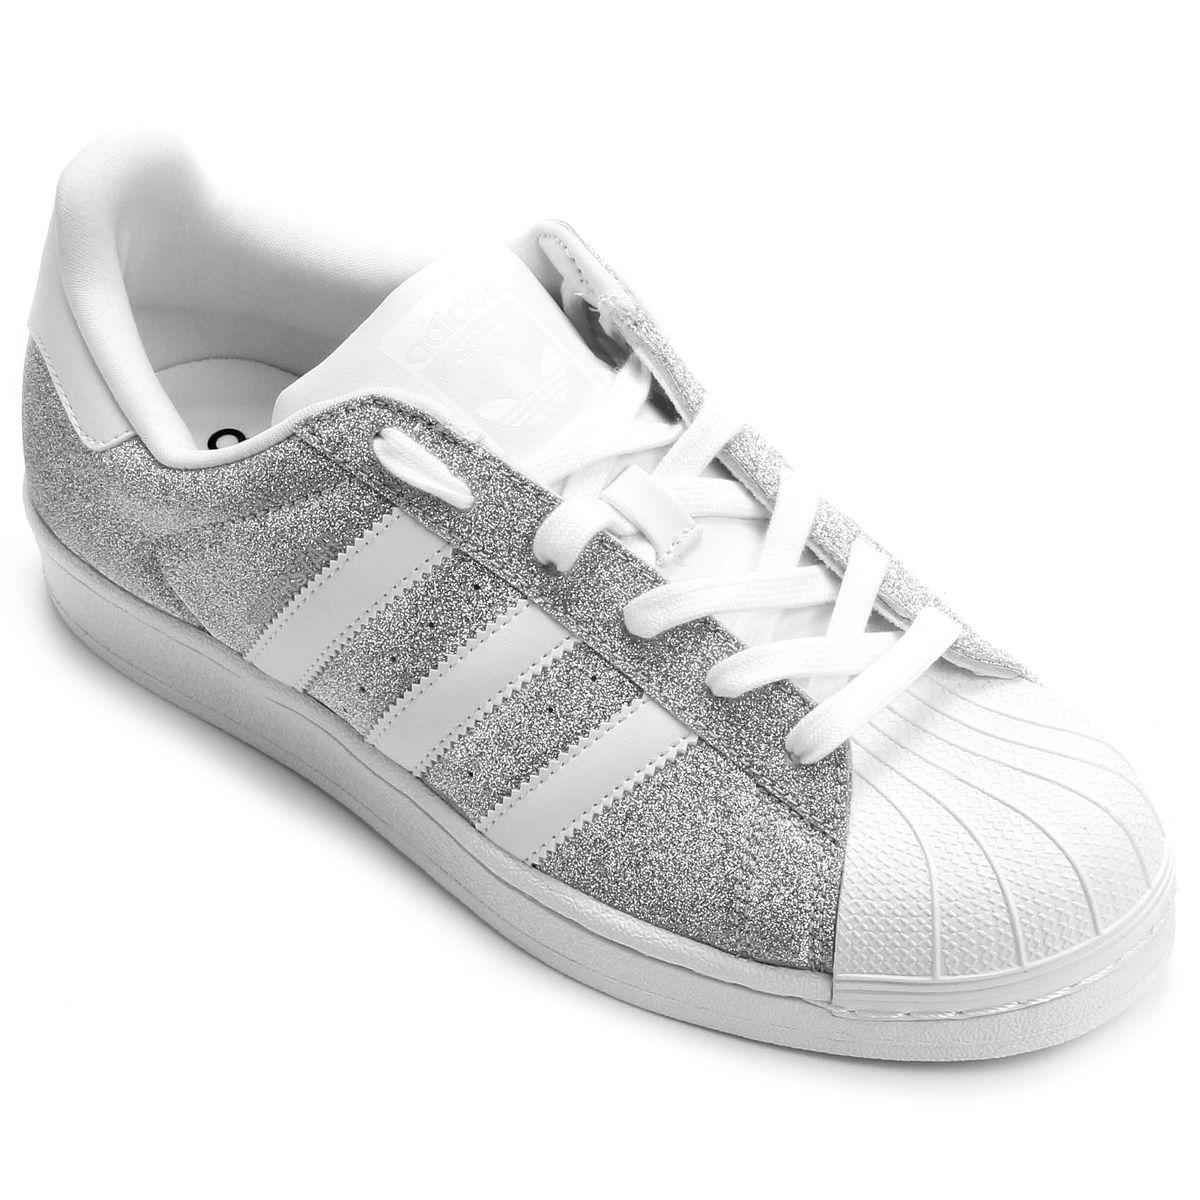 afedad12f79 Tênis Adidas Superstar Feminino - Prata e Branco